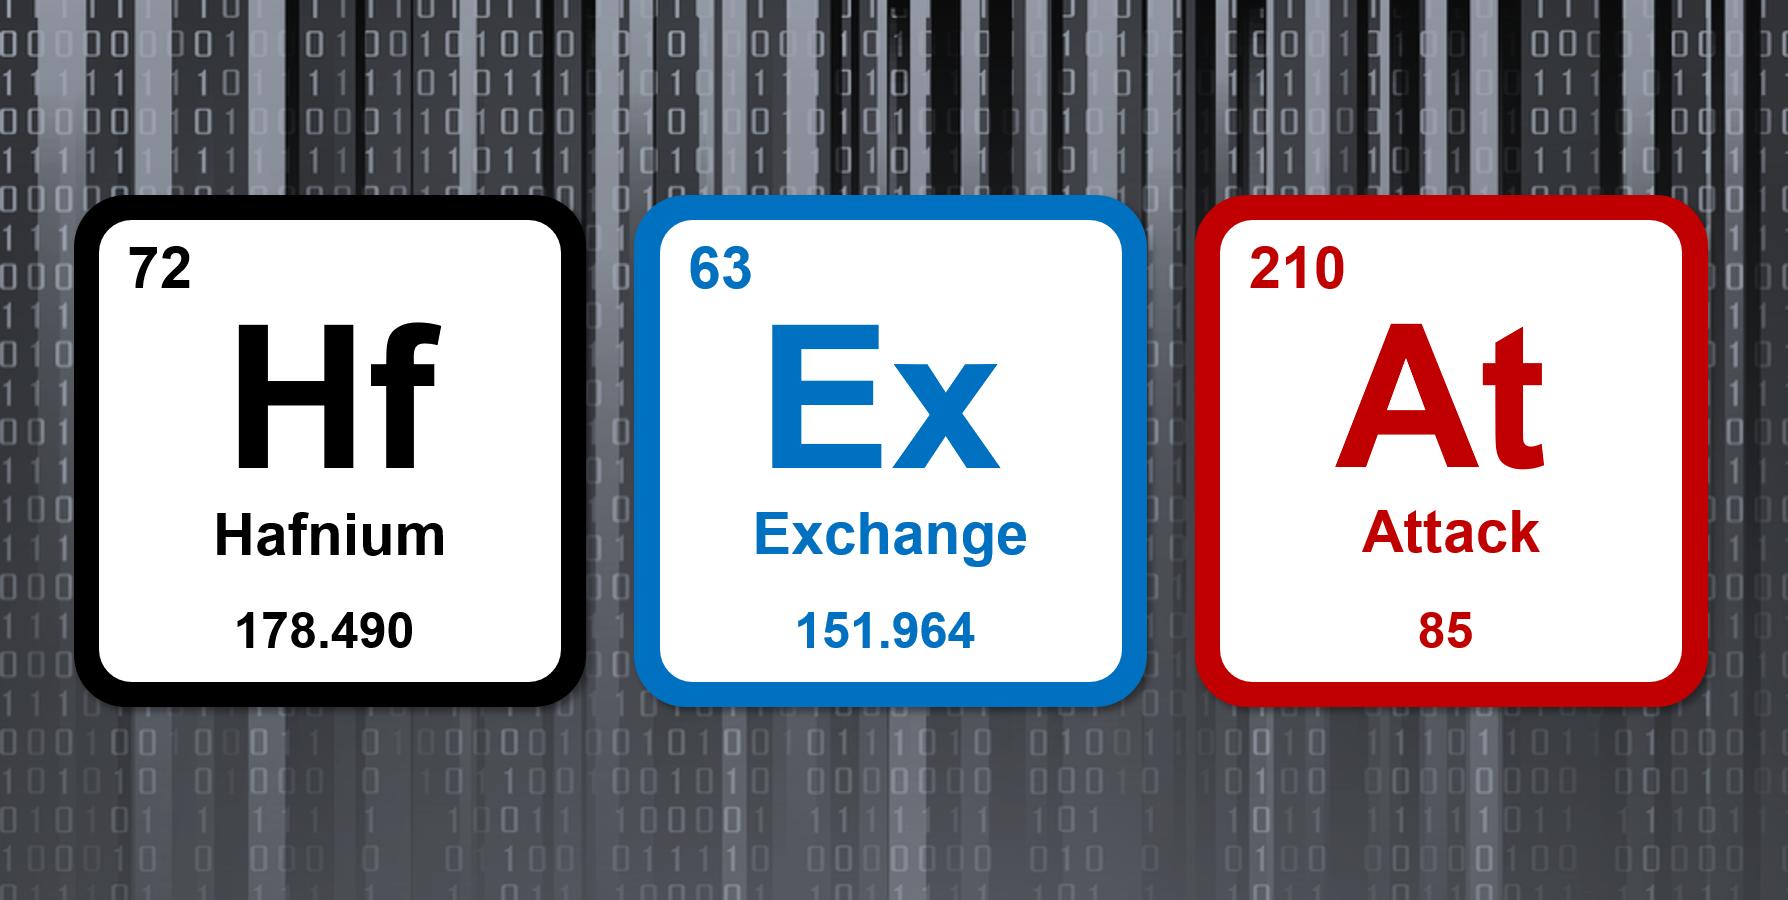 Hafnium & Exchange: Elements of the Attack